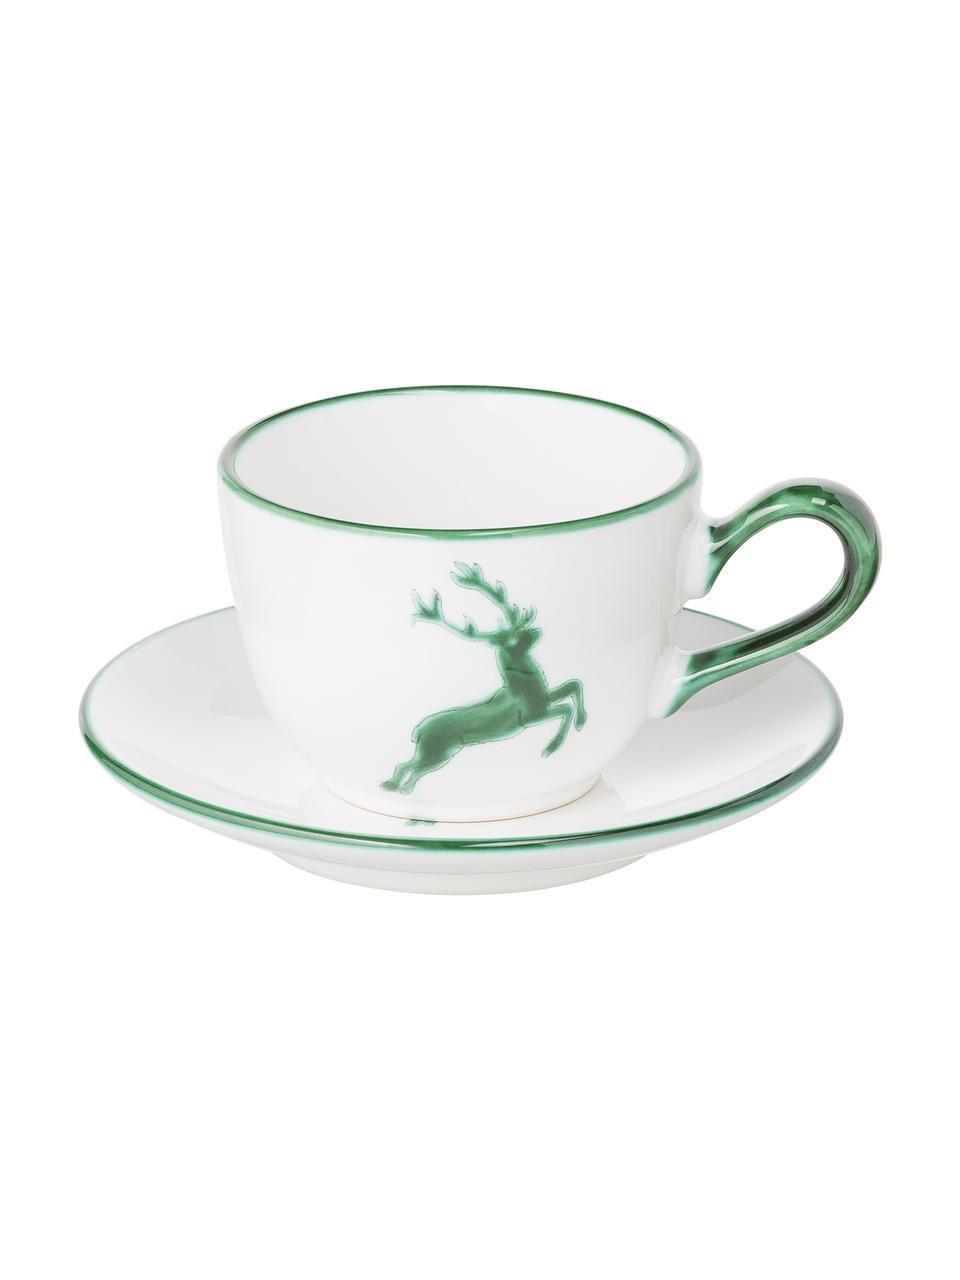 Handbemaltes Kaffeeservice Classic Grüner Hirsch, 2 Personen (6-tlg.), Keramik, Grün, Weiß, Sondergrößen